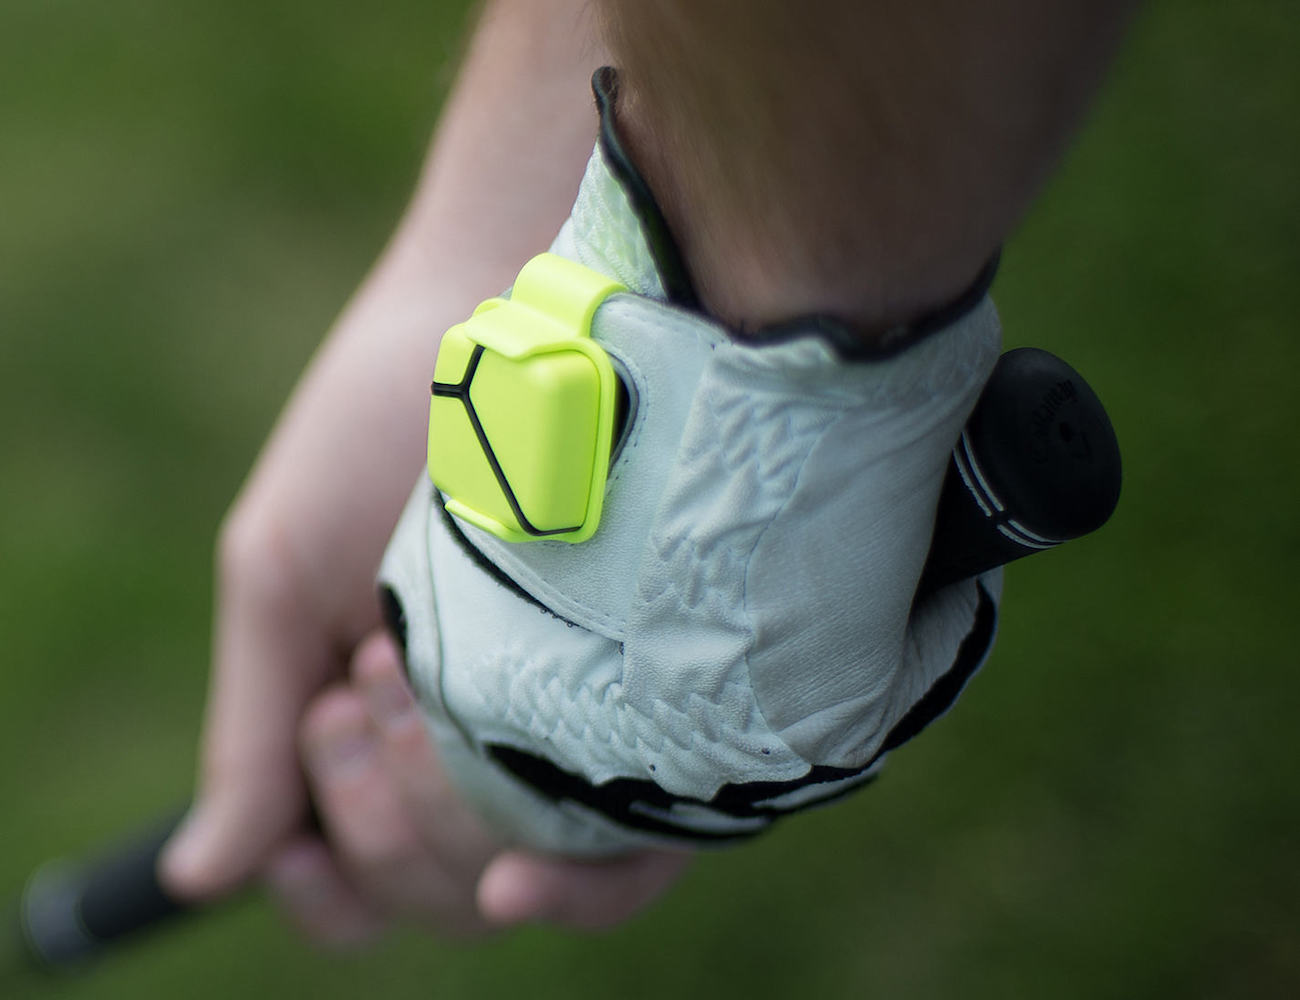 Zepp Golf 3D Training System